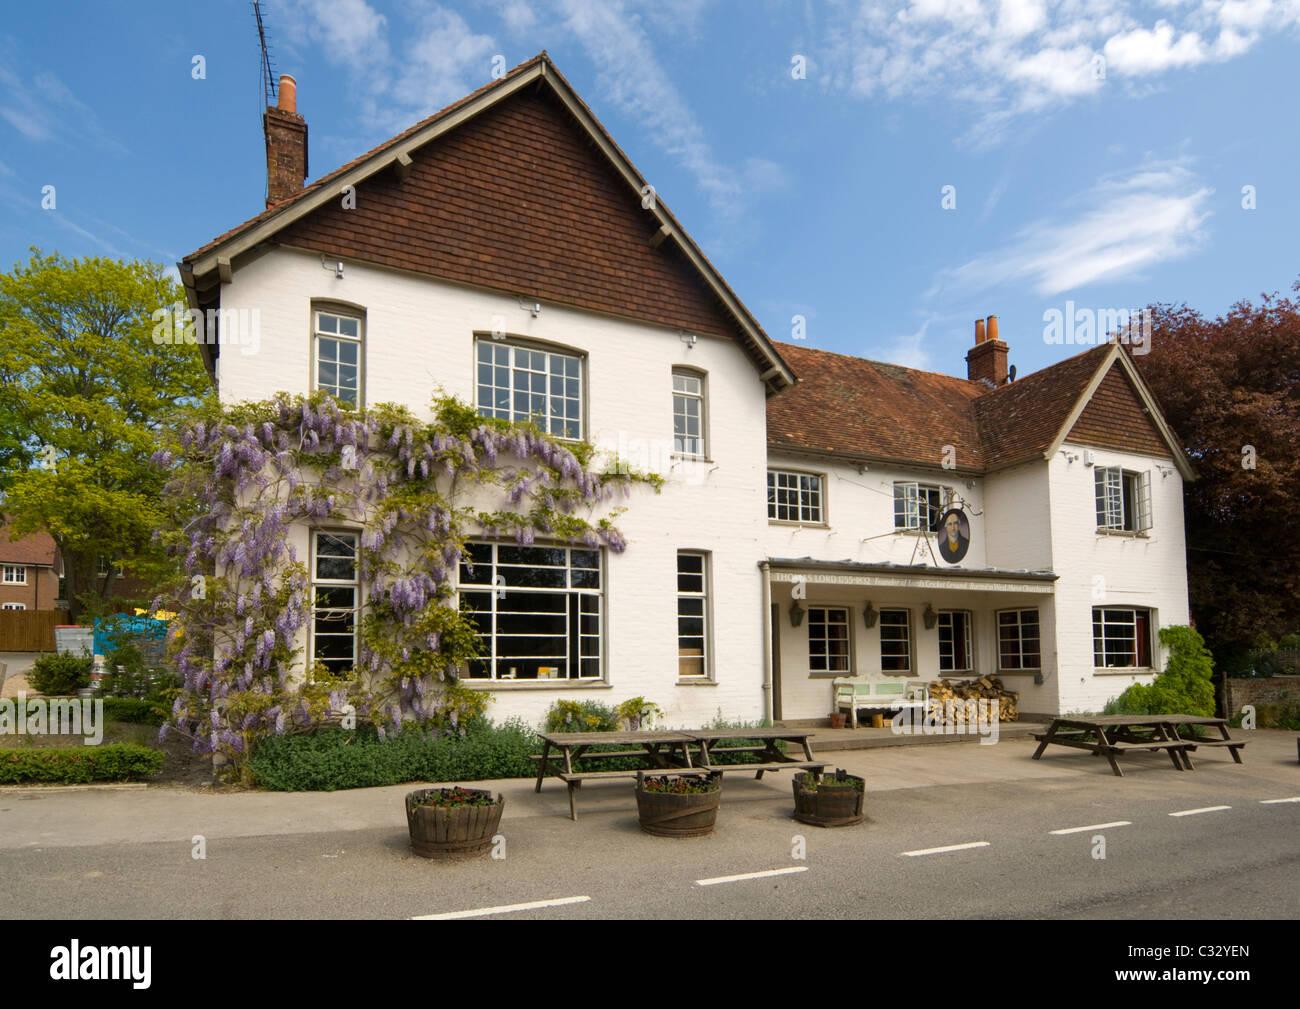 The Thomas Lord Pub West Meon Hampshire UK - Stock Image